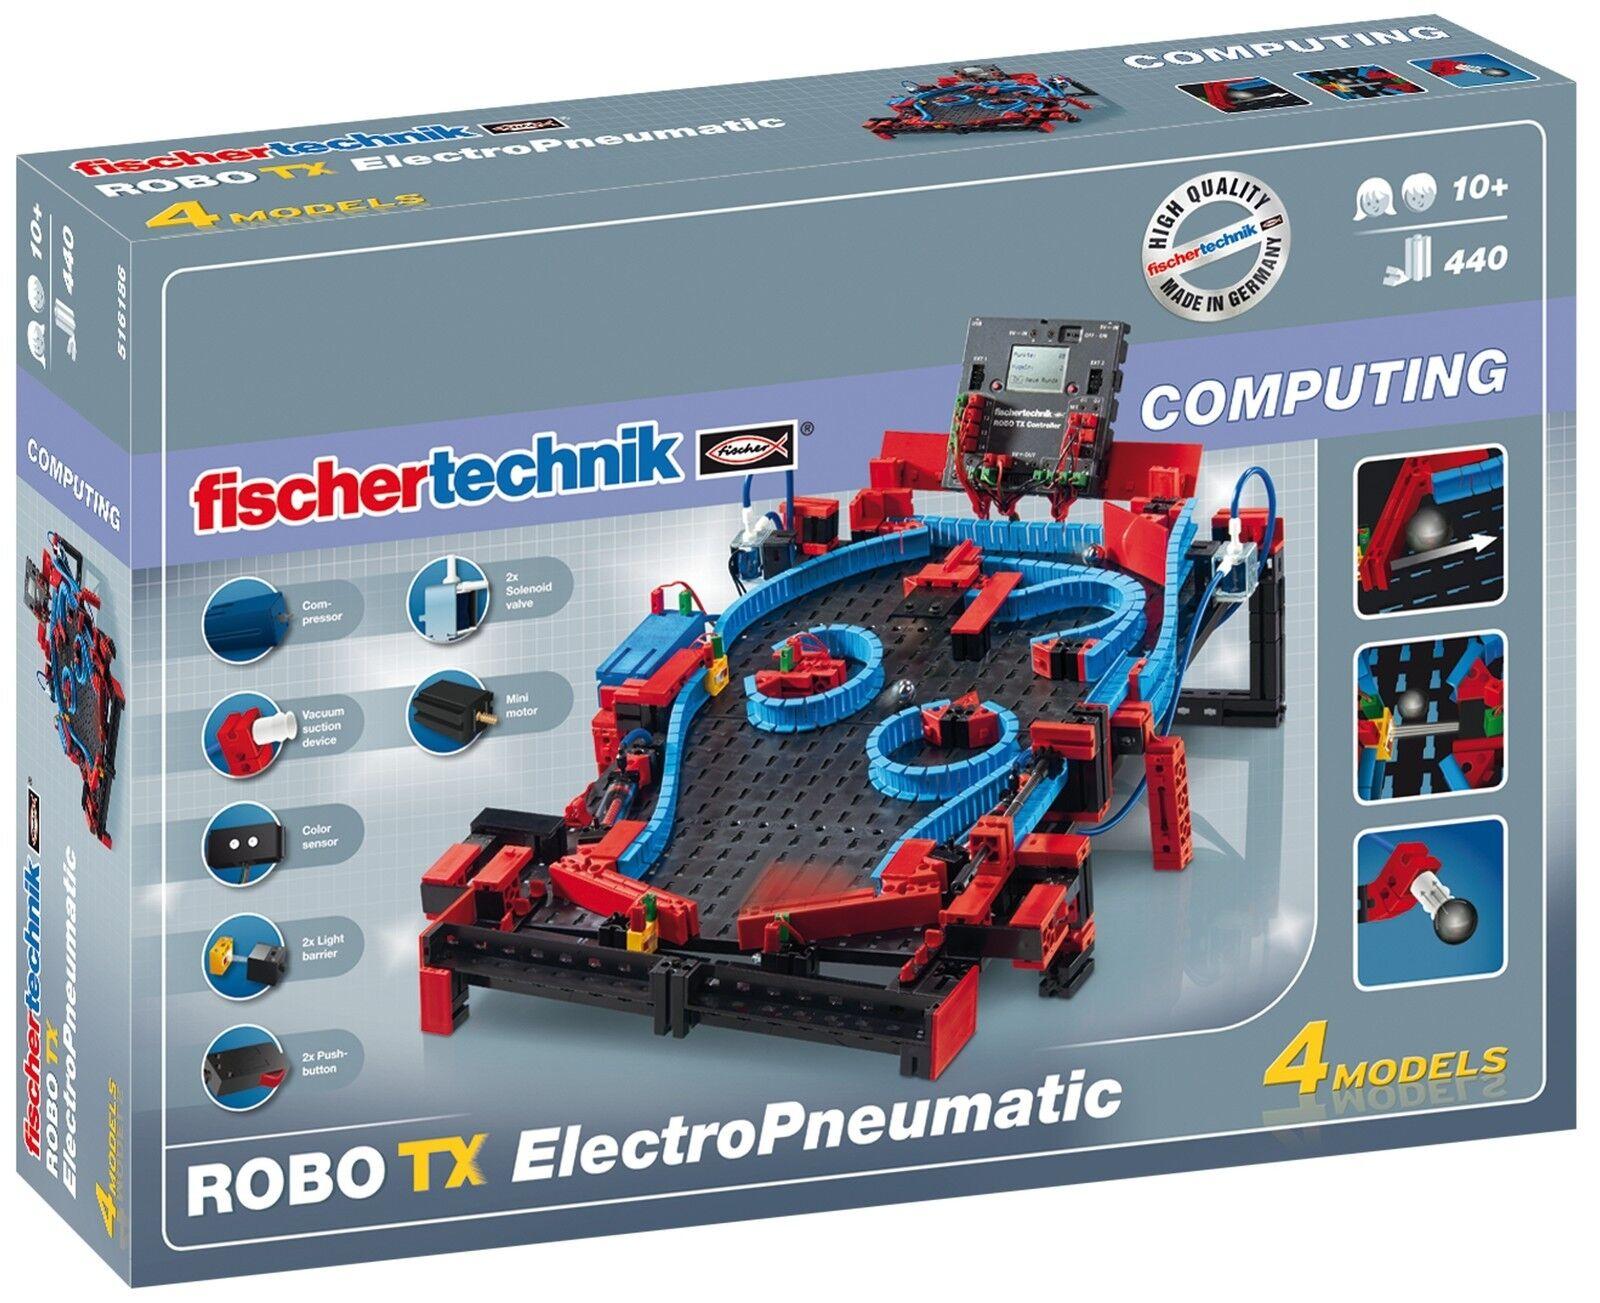 nuevo  Fischertechnik 516186 robo TX electro Pneumatic  OVP